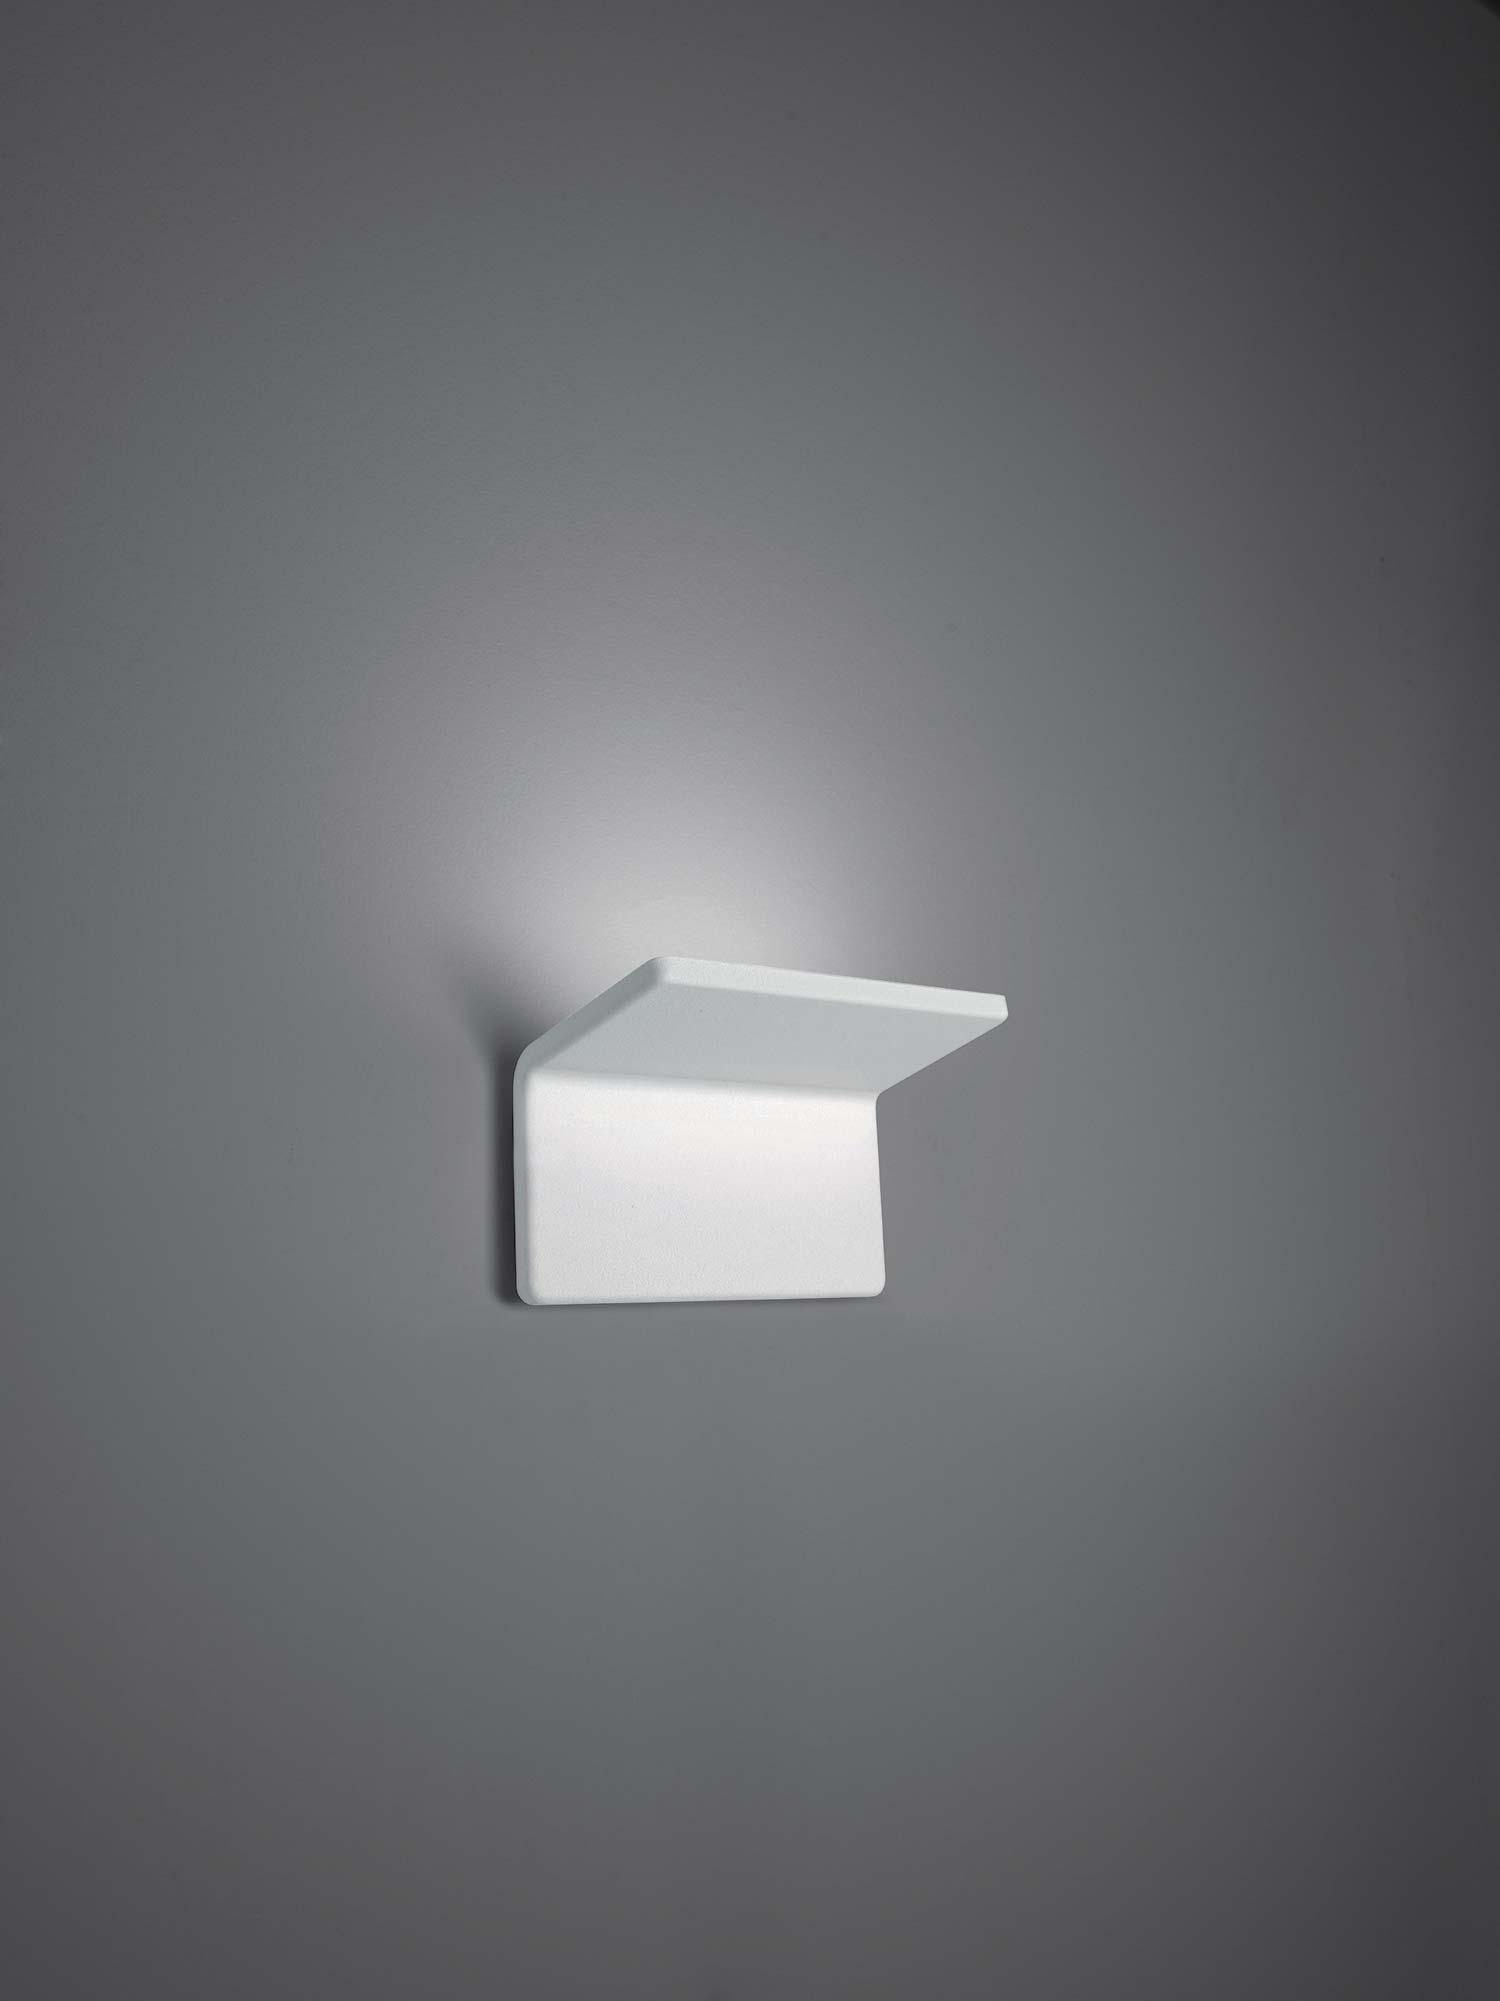 artemide cuma 20 applique 28w led 3000k bianco 1152010a l mparas de dise o. Black Bedroom Furniture Sets. Home Design Ideas